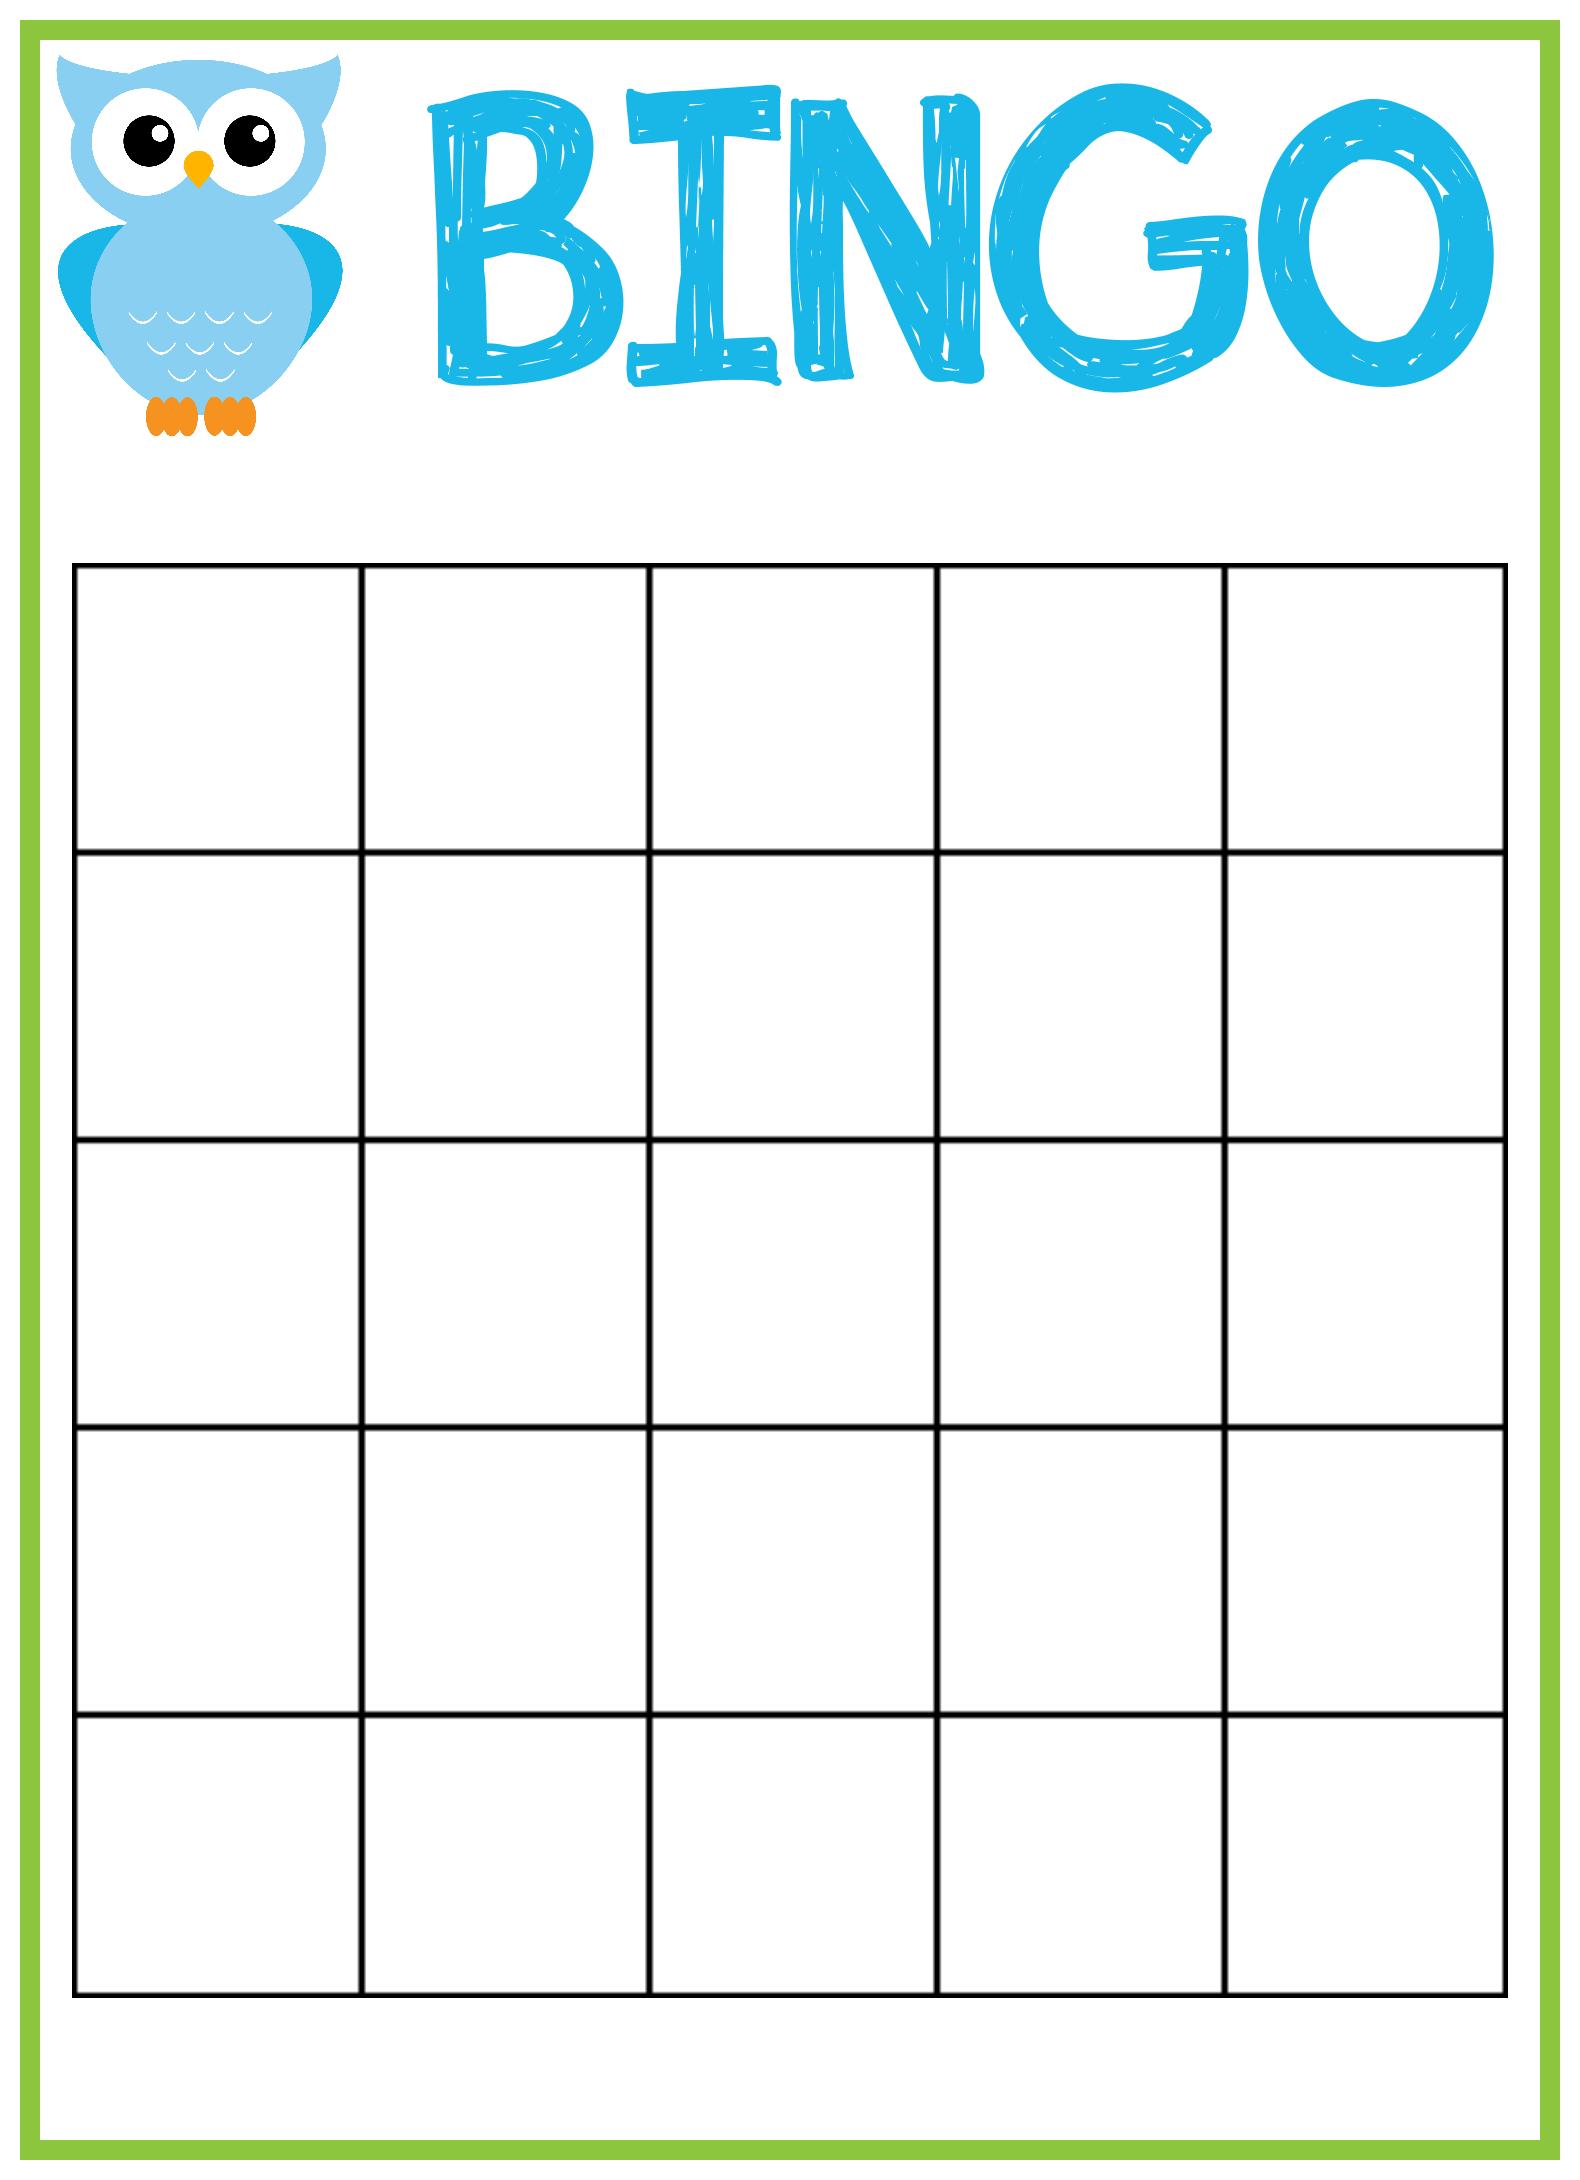 Free Bingo Card Template 21X21 - Cards Design Templates Within Blank Bingo Card Template Microsoft Word